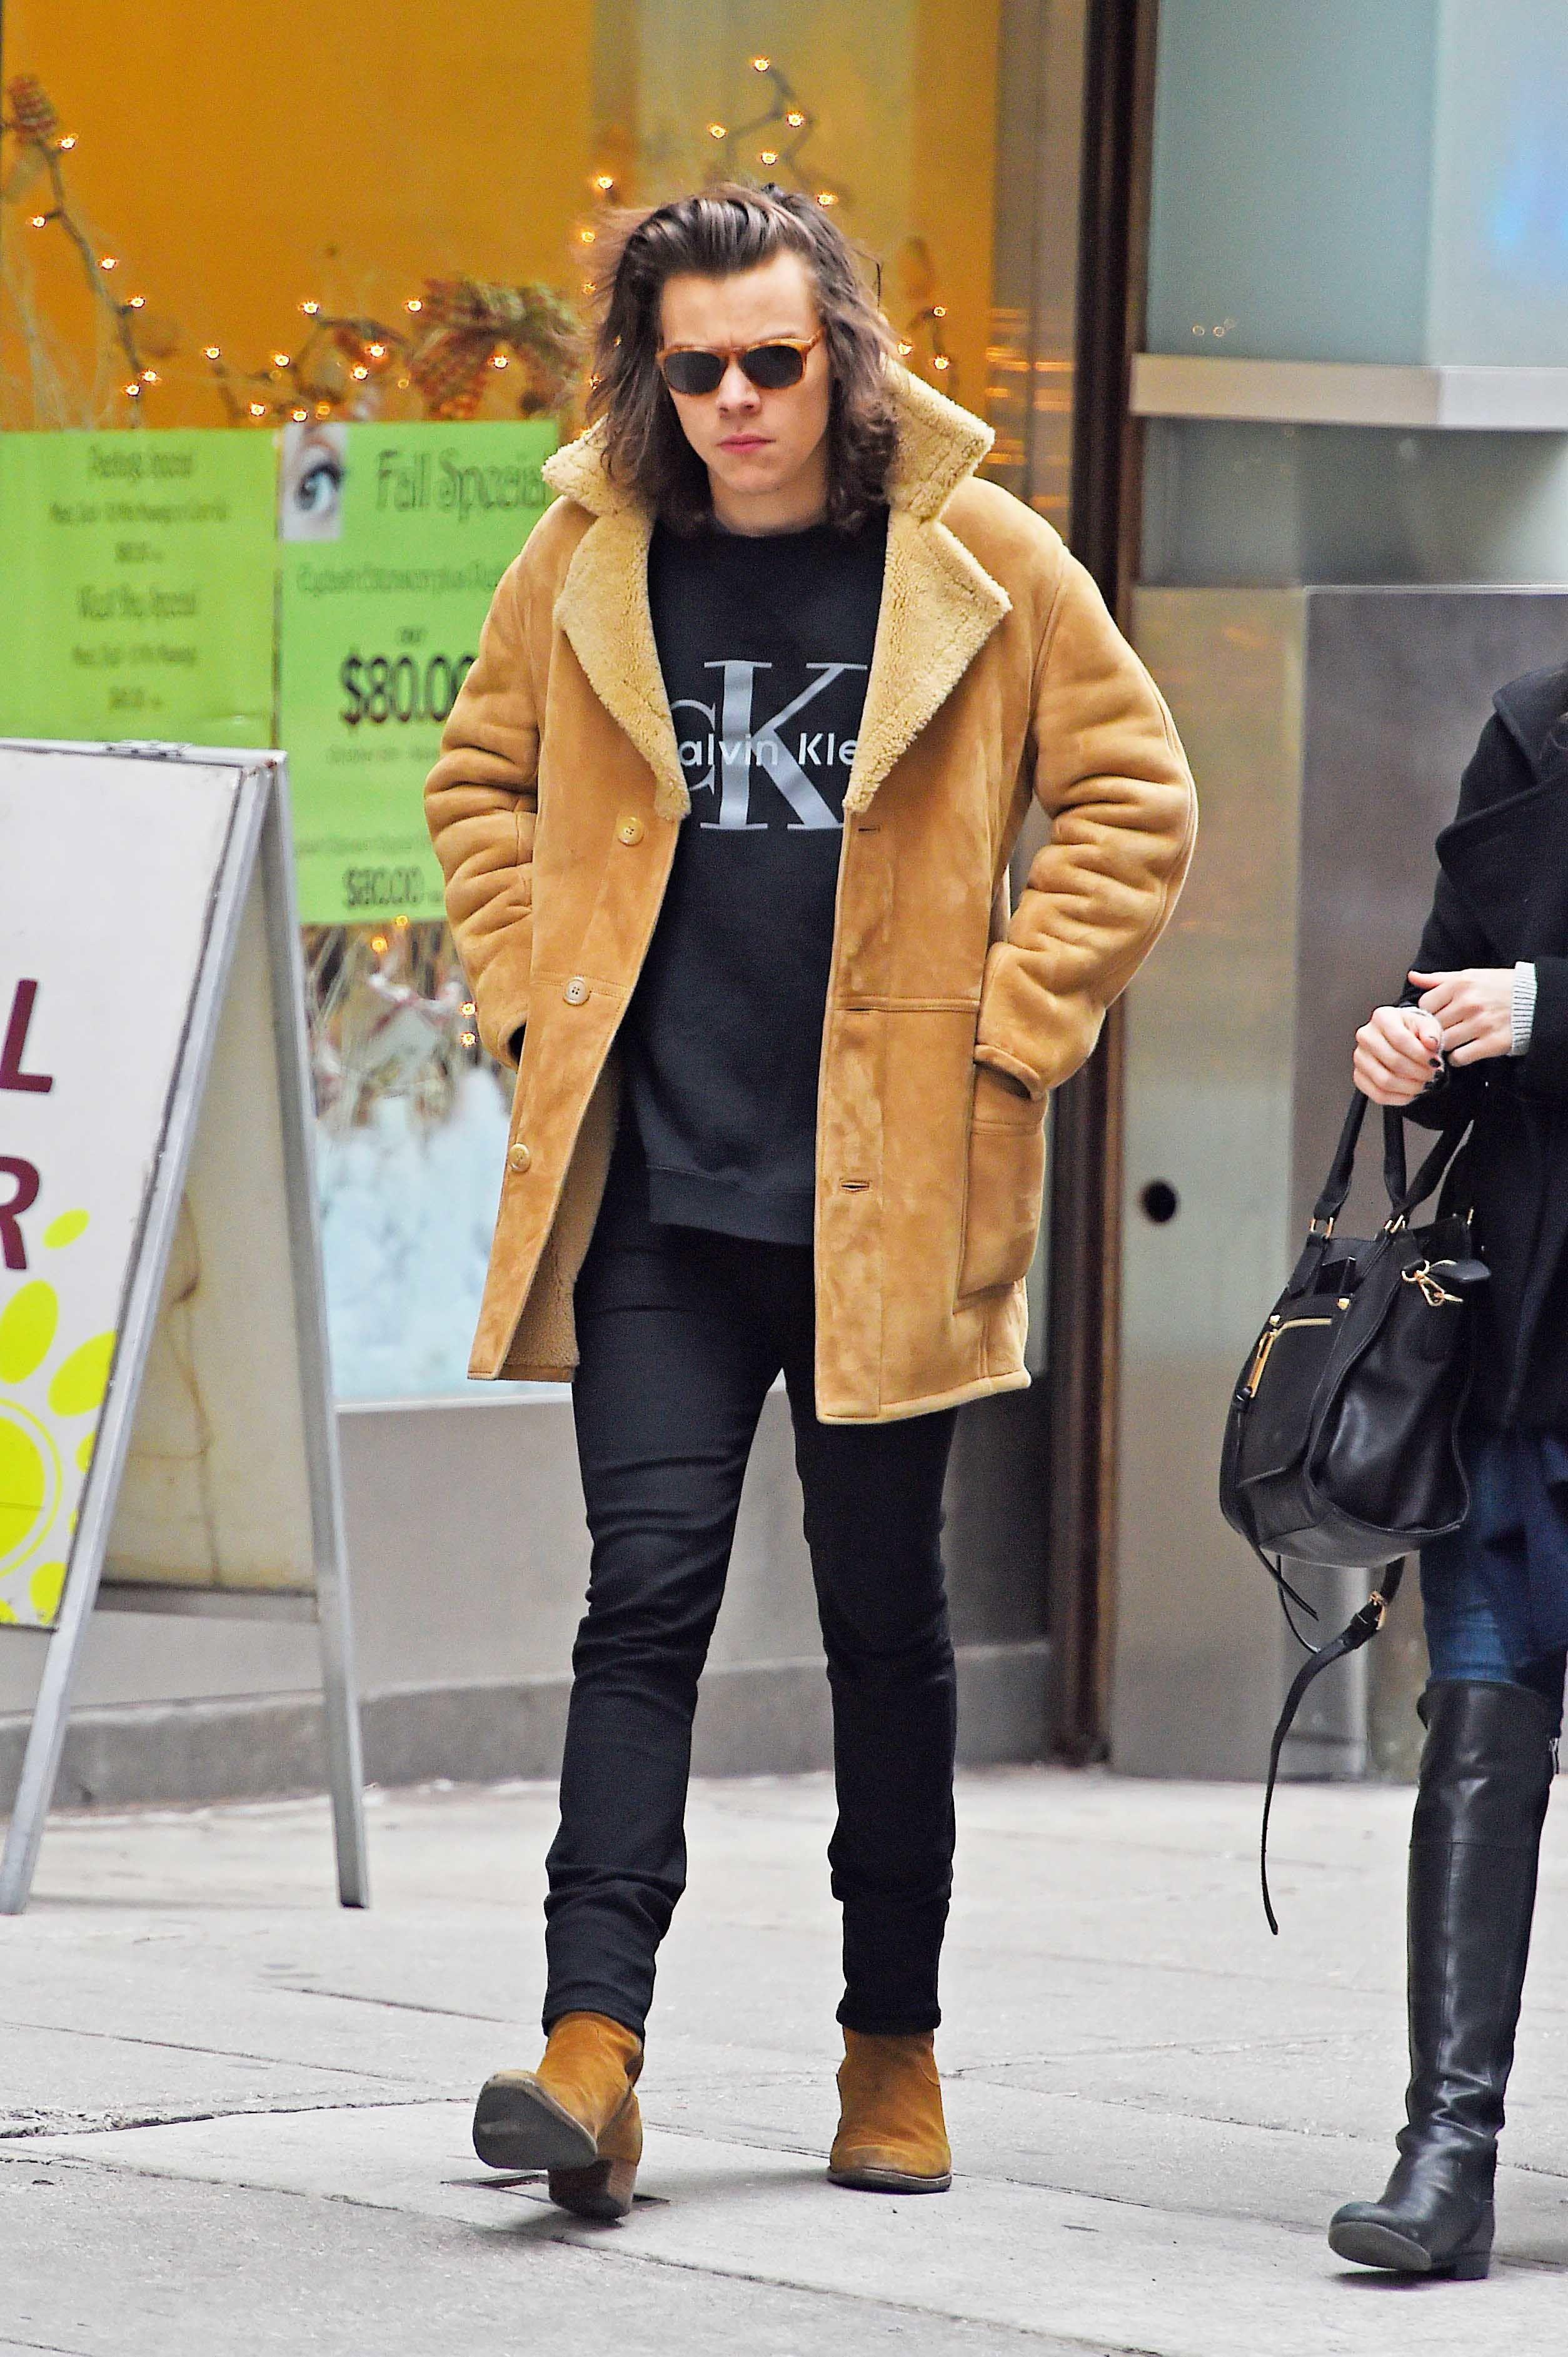 b9fd739d Harry Styles' Boots — One Direction Saint Laurent Chelsea Boots | Teen Vogue